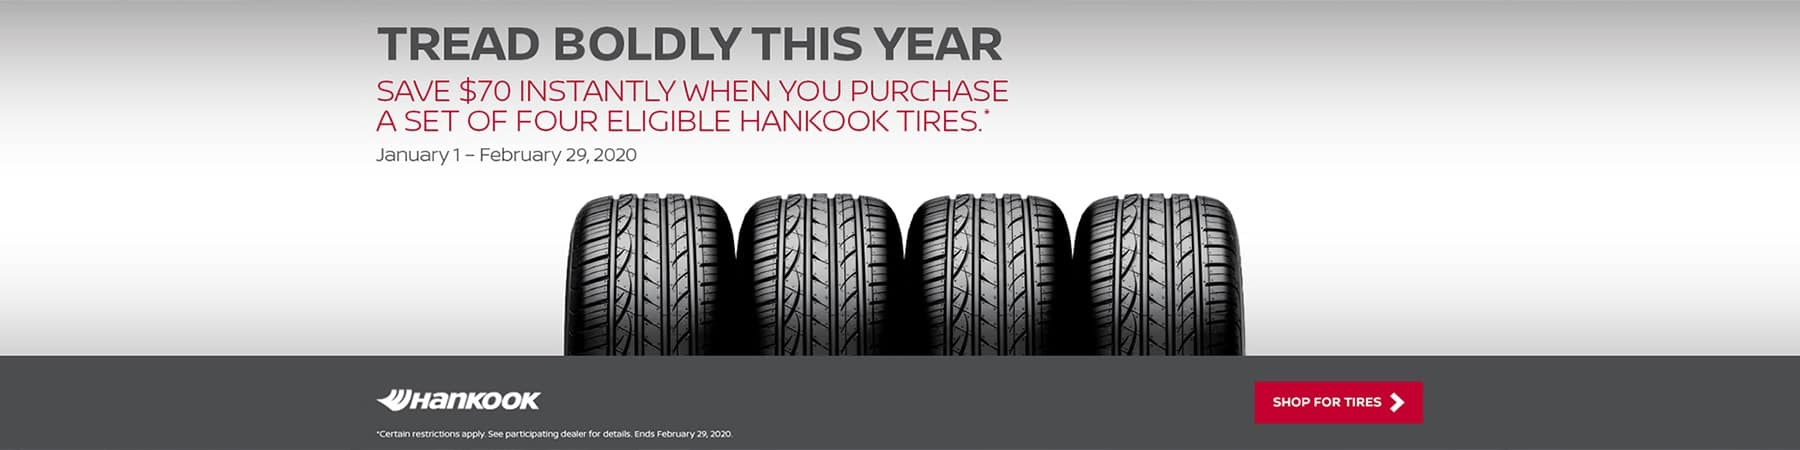 Nissan-Tire-Offer-Hankook-min